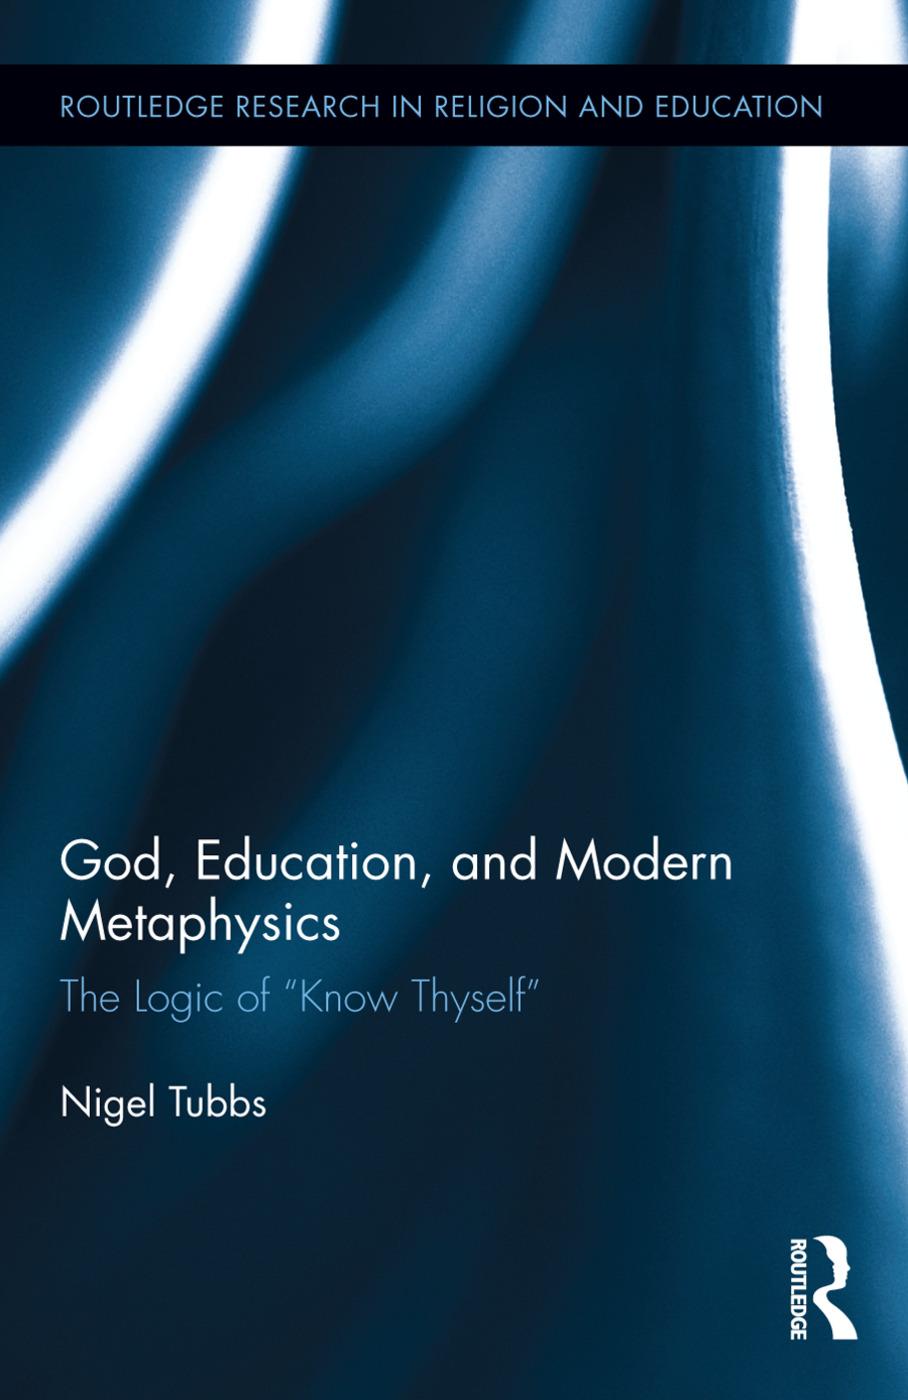 God, Education, and Modern Metaphysics: The Logic of